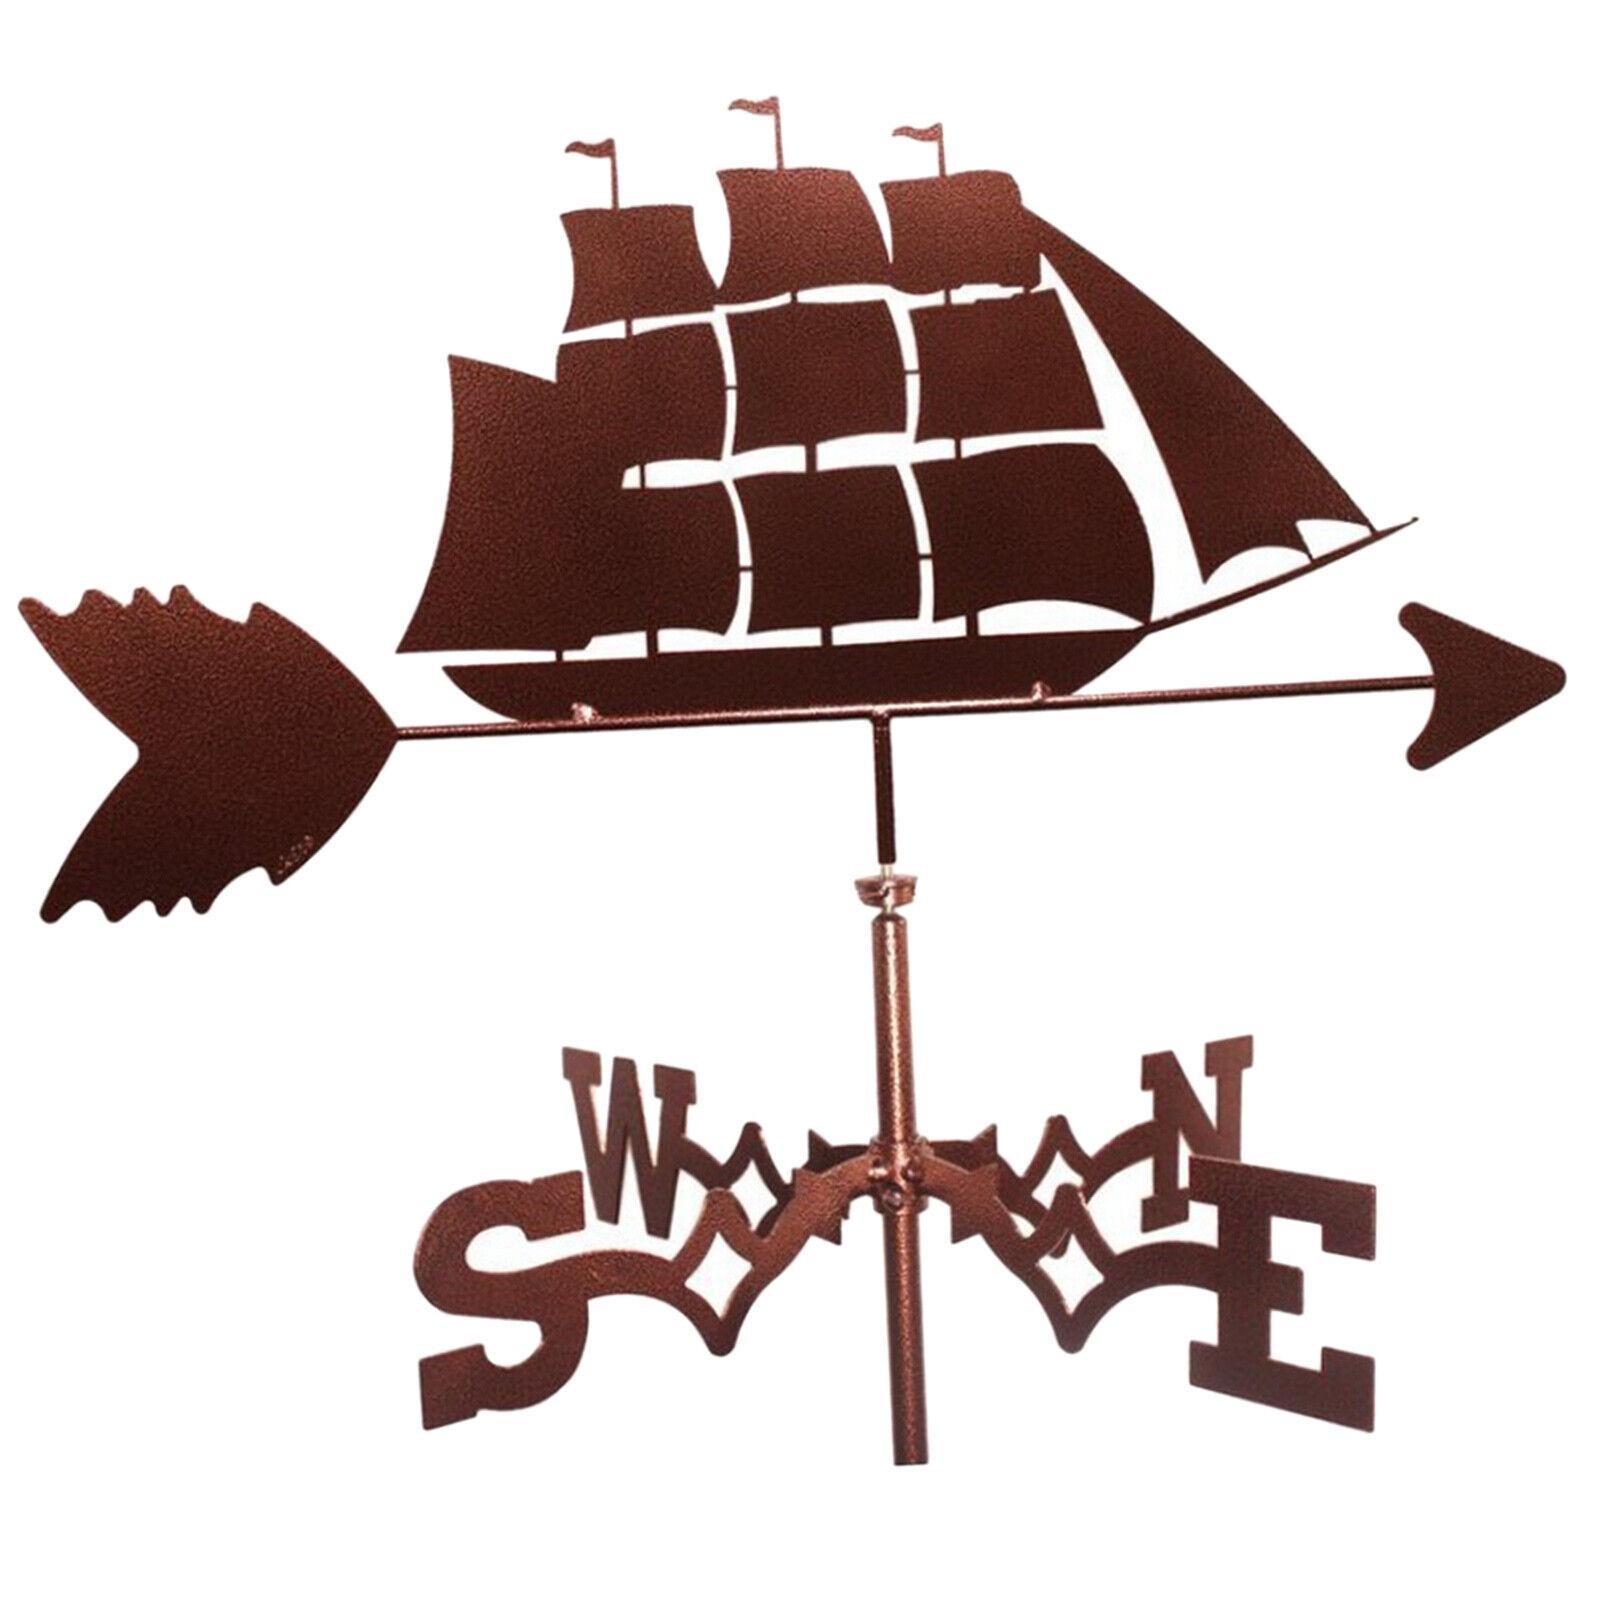 Decorative Stainless Steel Sailboat Weathervane Roof Mount Weather Vane Barn